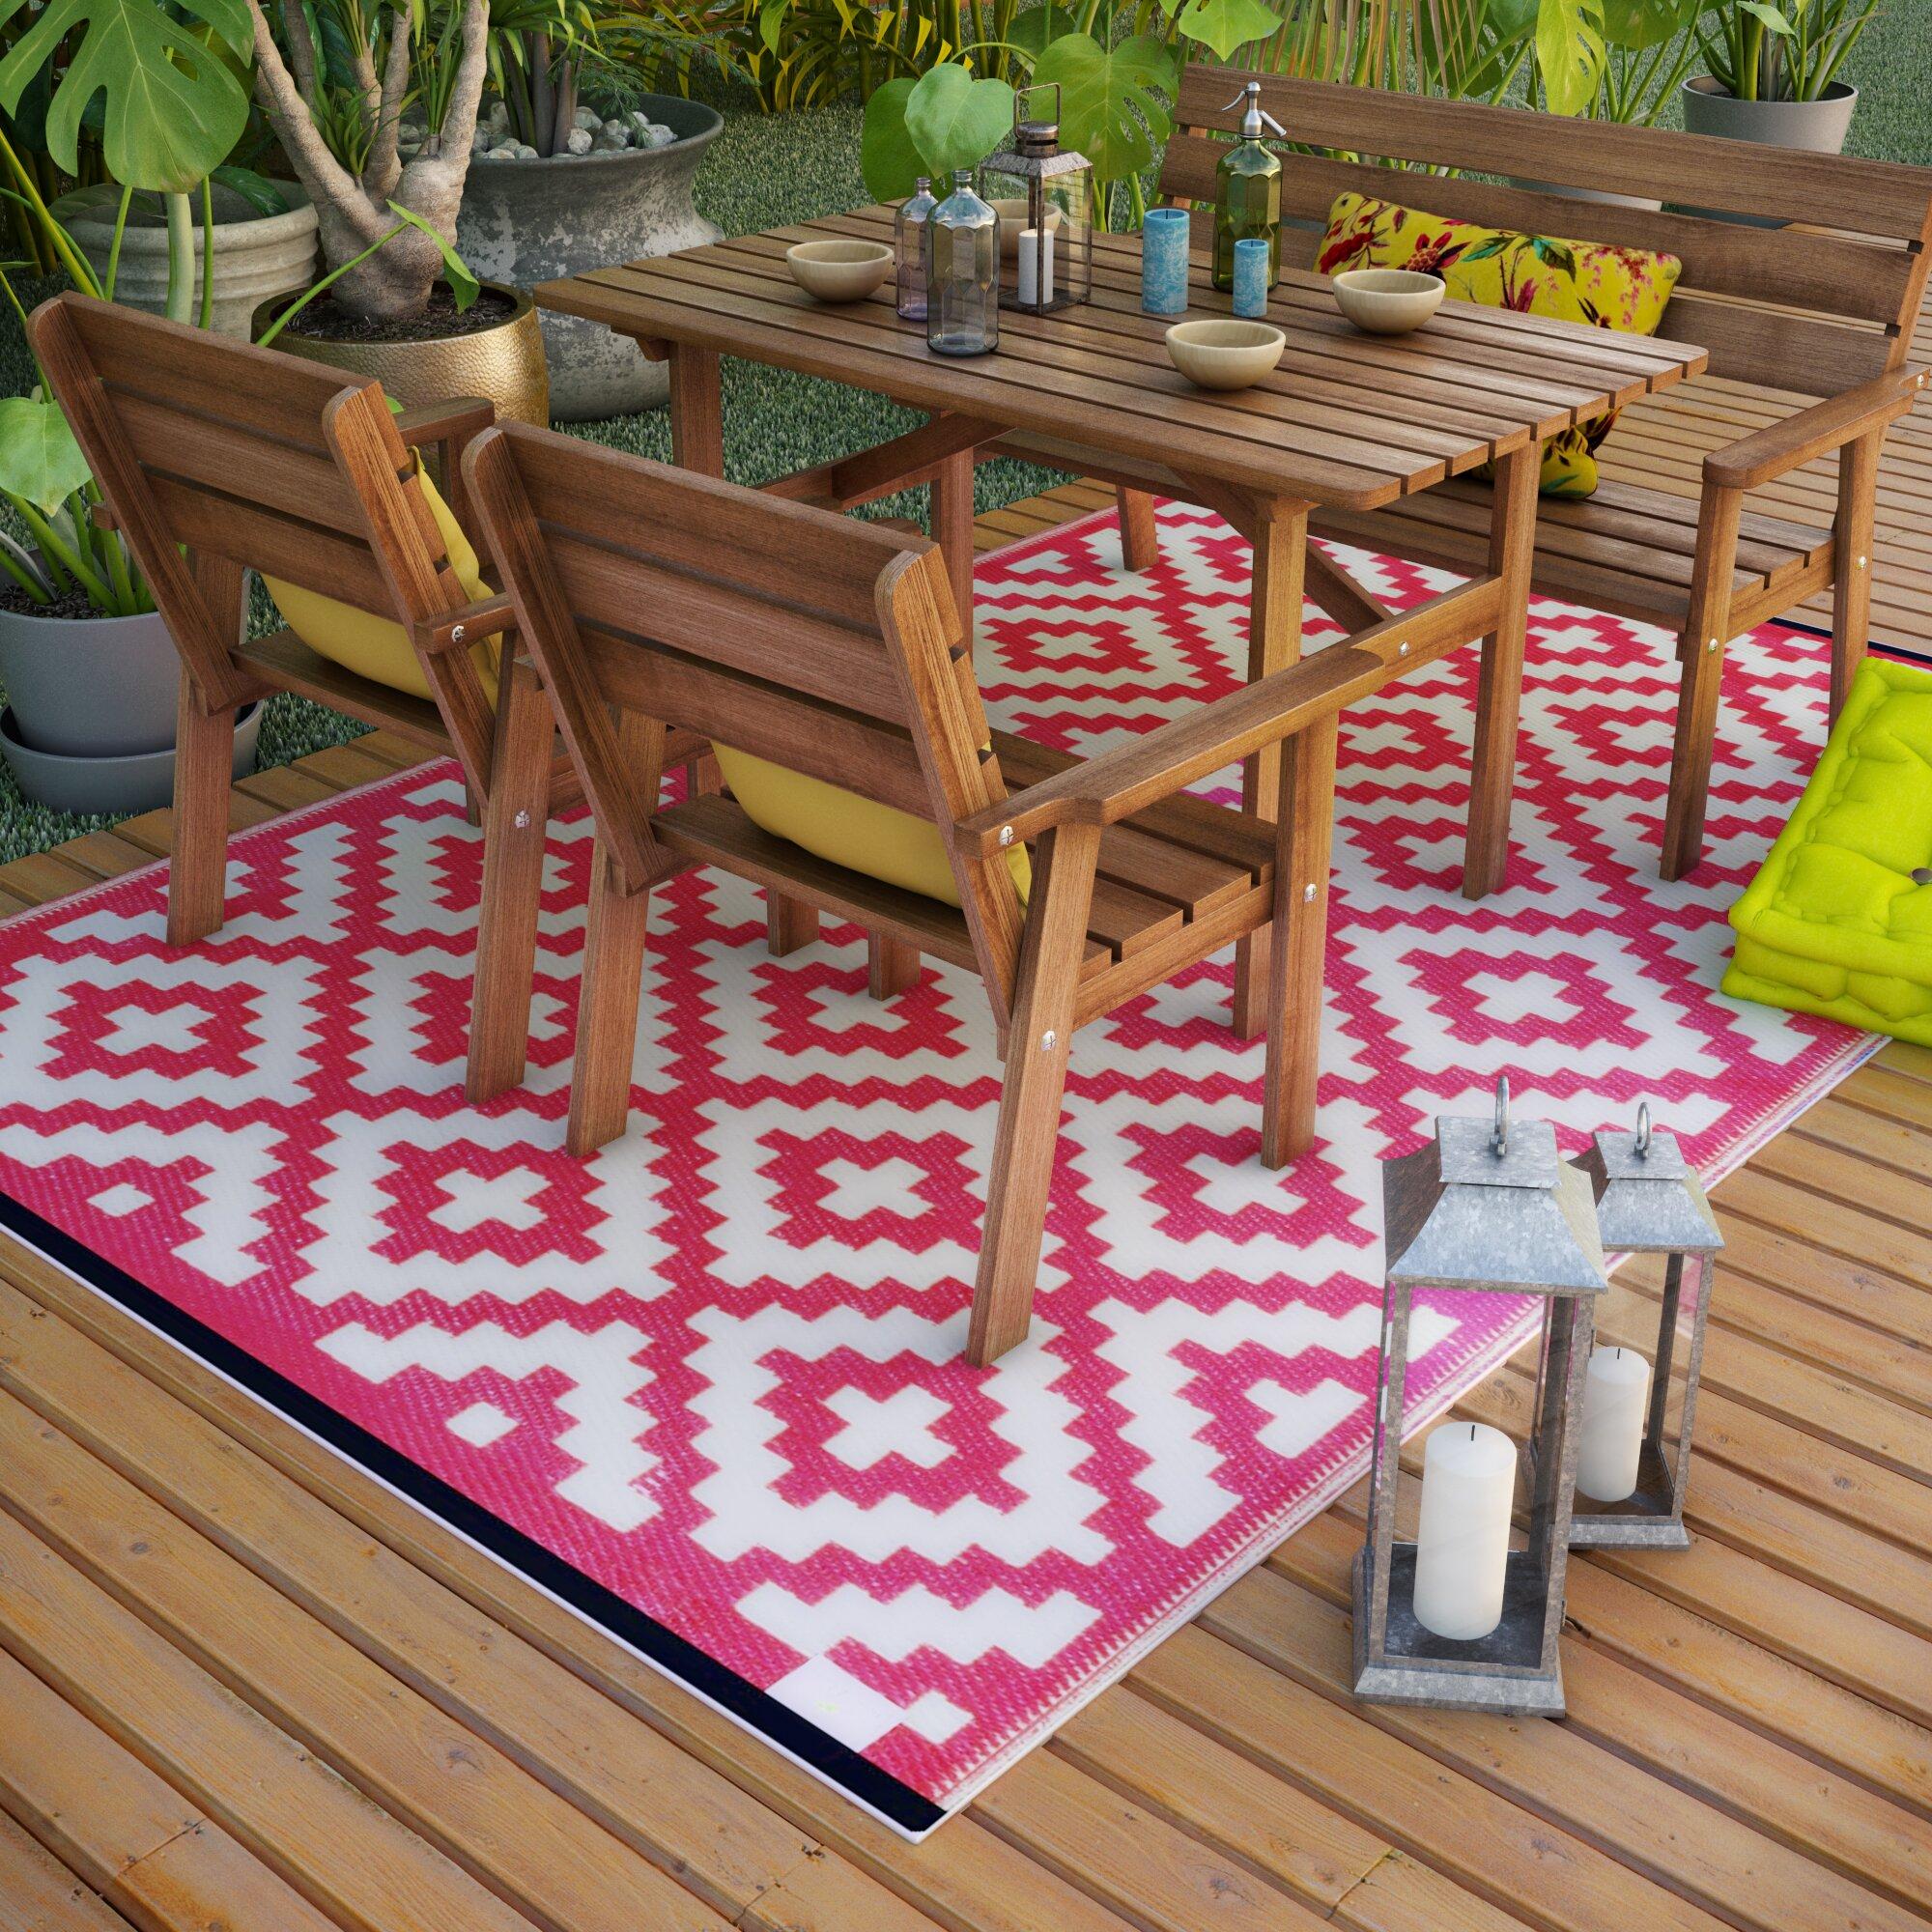 Riley Ave Kenji Pink Indoor Outdoor Area Rug & Reviews